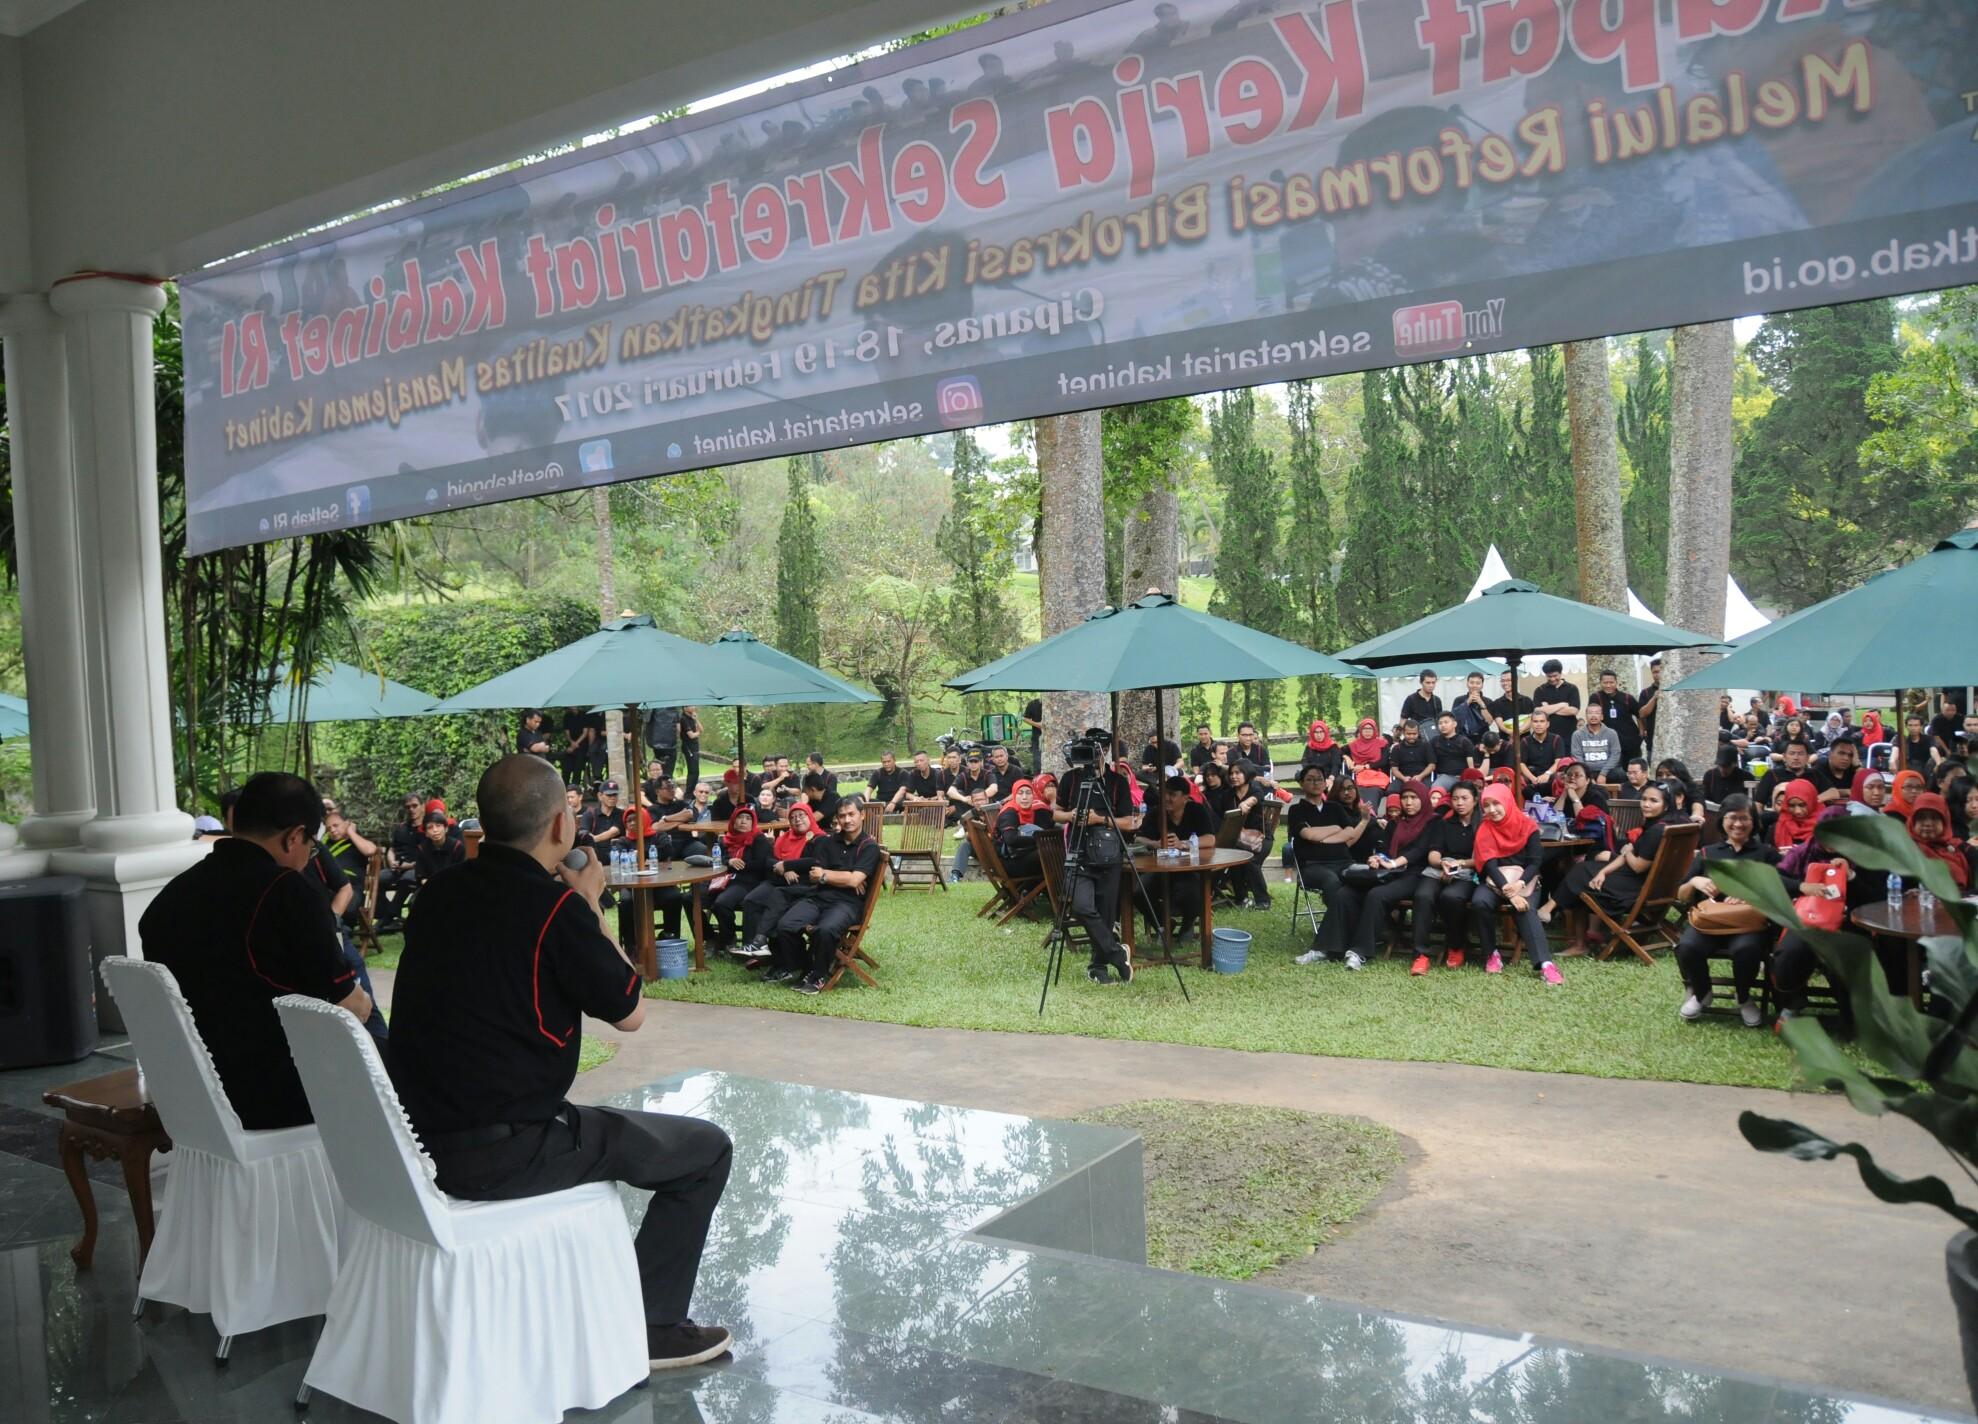 Suasana kekeluargaan dalam sesi dialog dengan Seskab dalam rangkaian acara Rapat Kerja Sekretariat Kabinet di Istana Kepresidenan Cipanas, Jawa Barat, Sabtu (18/2) sore. (Foto: Humas/Deni)